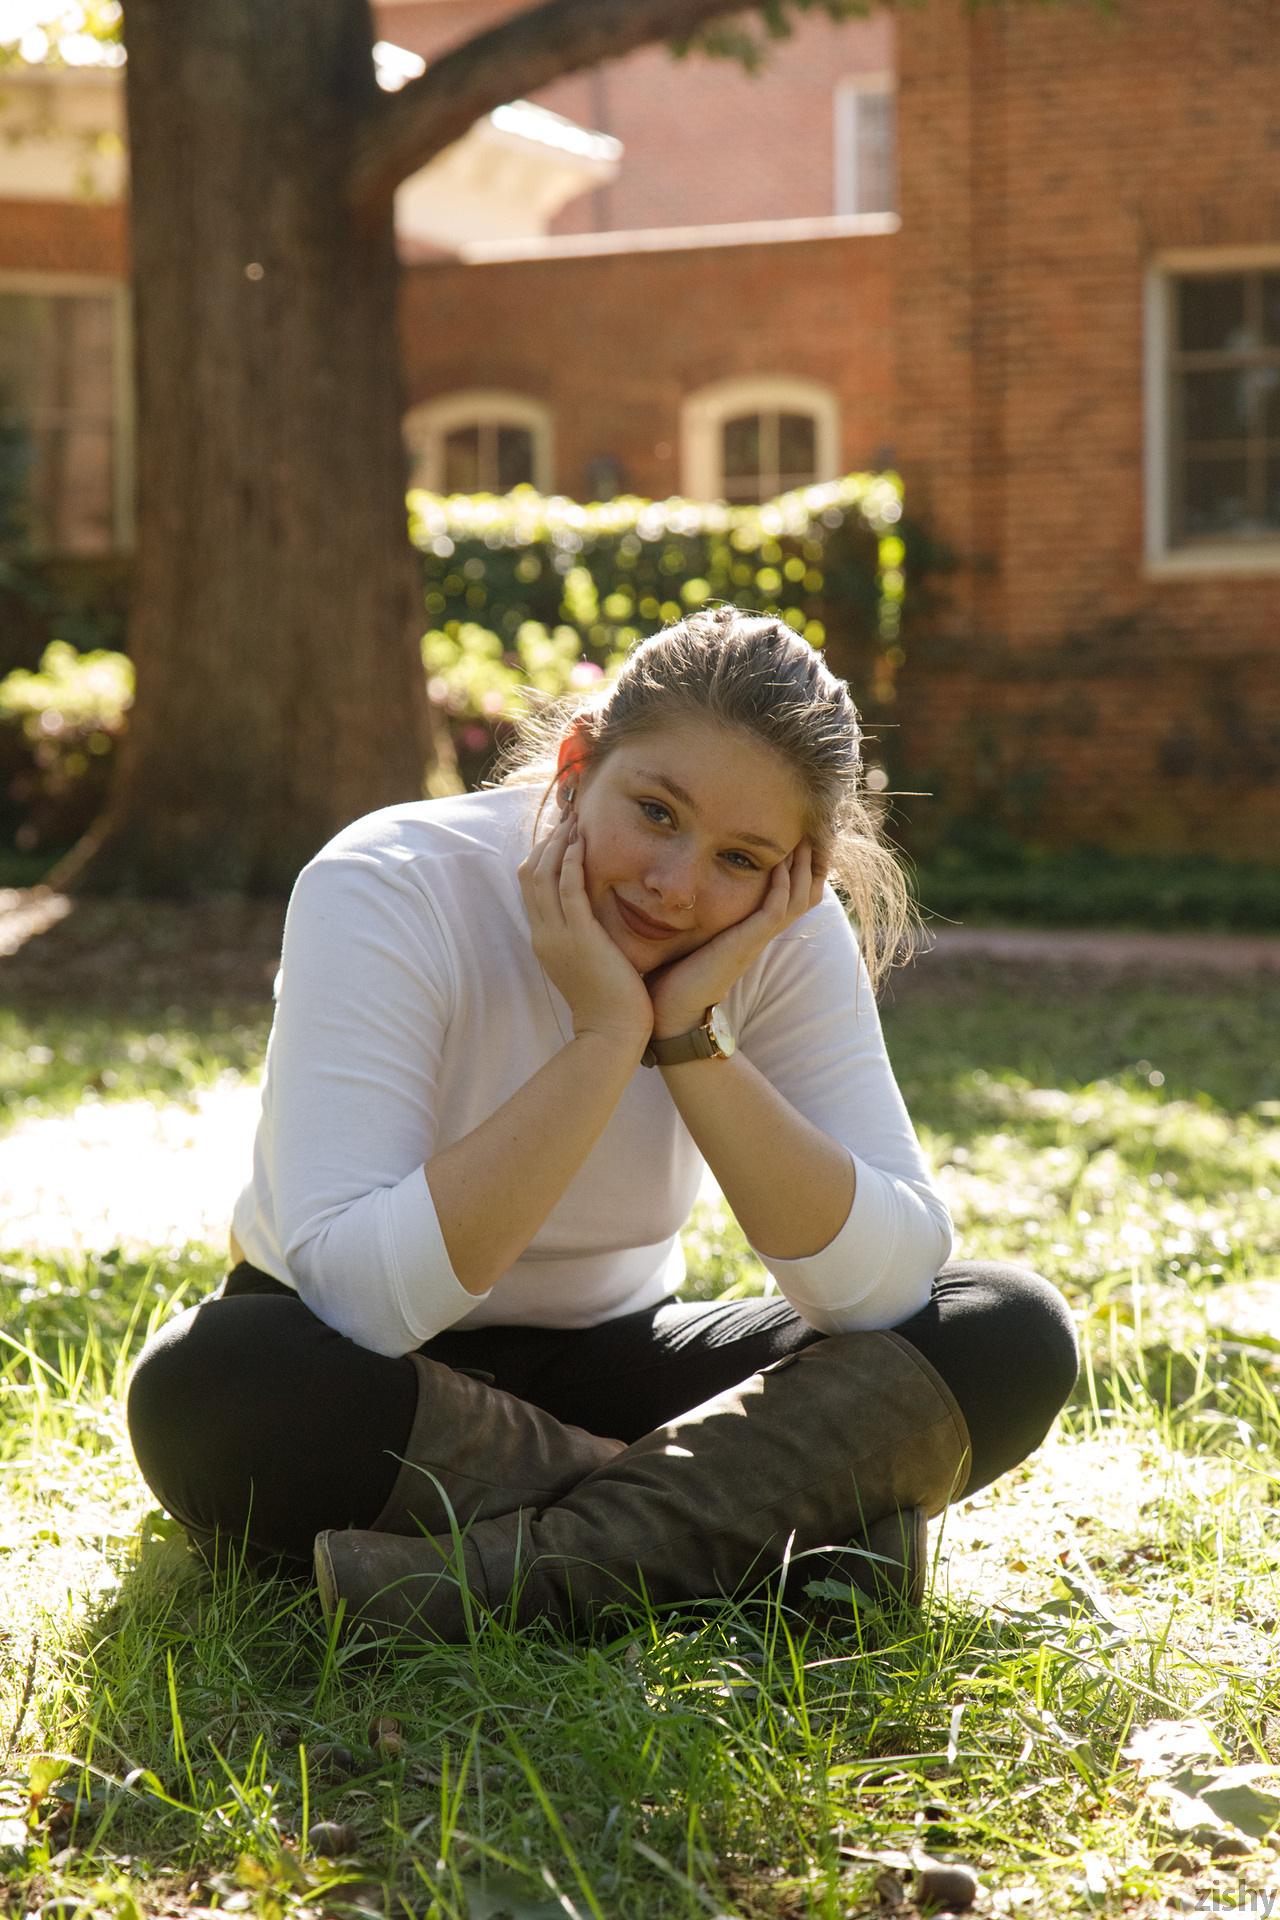 Fawn Richfield At Chapel Hill Zishy (24)